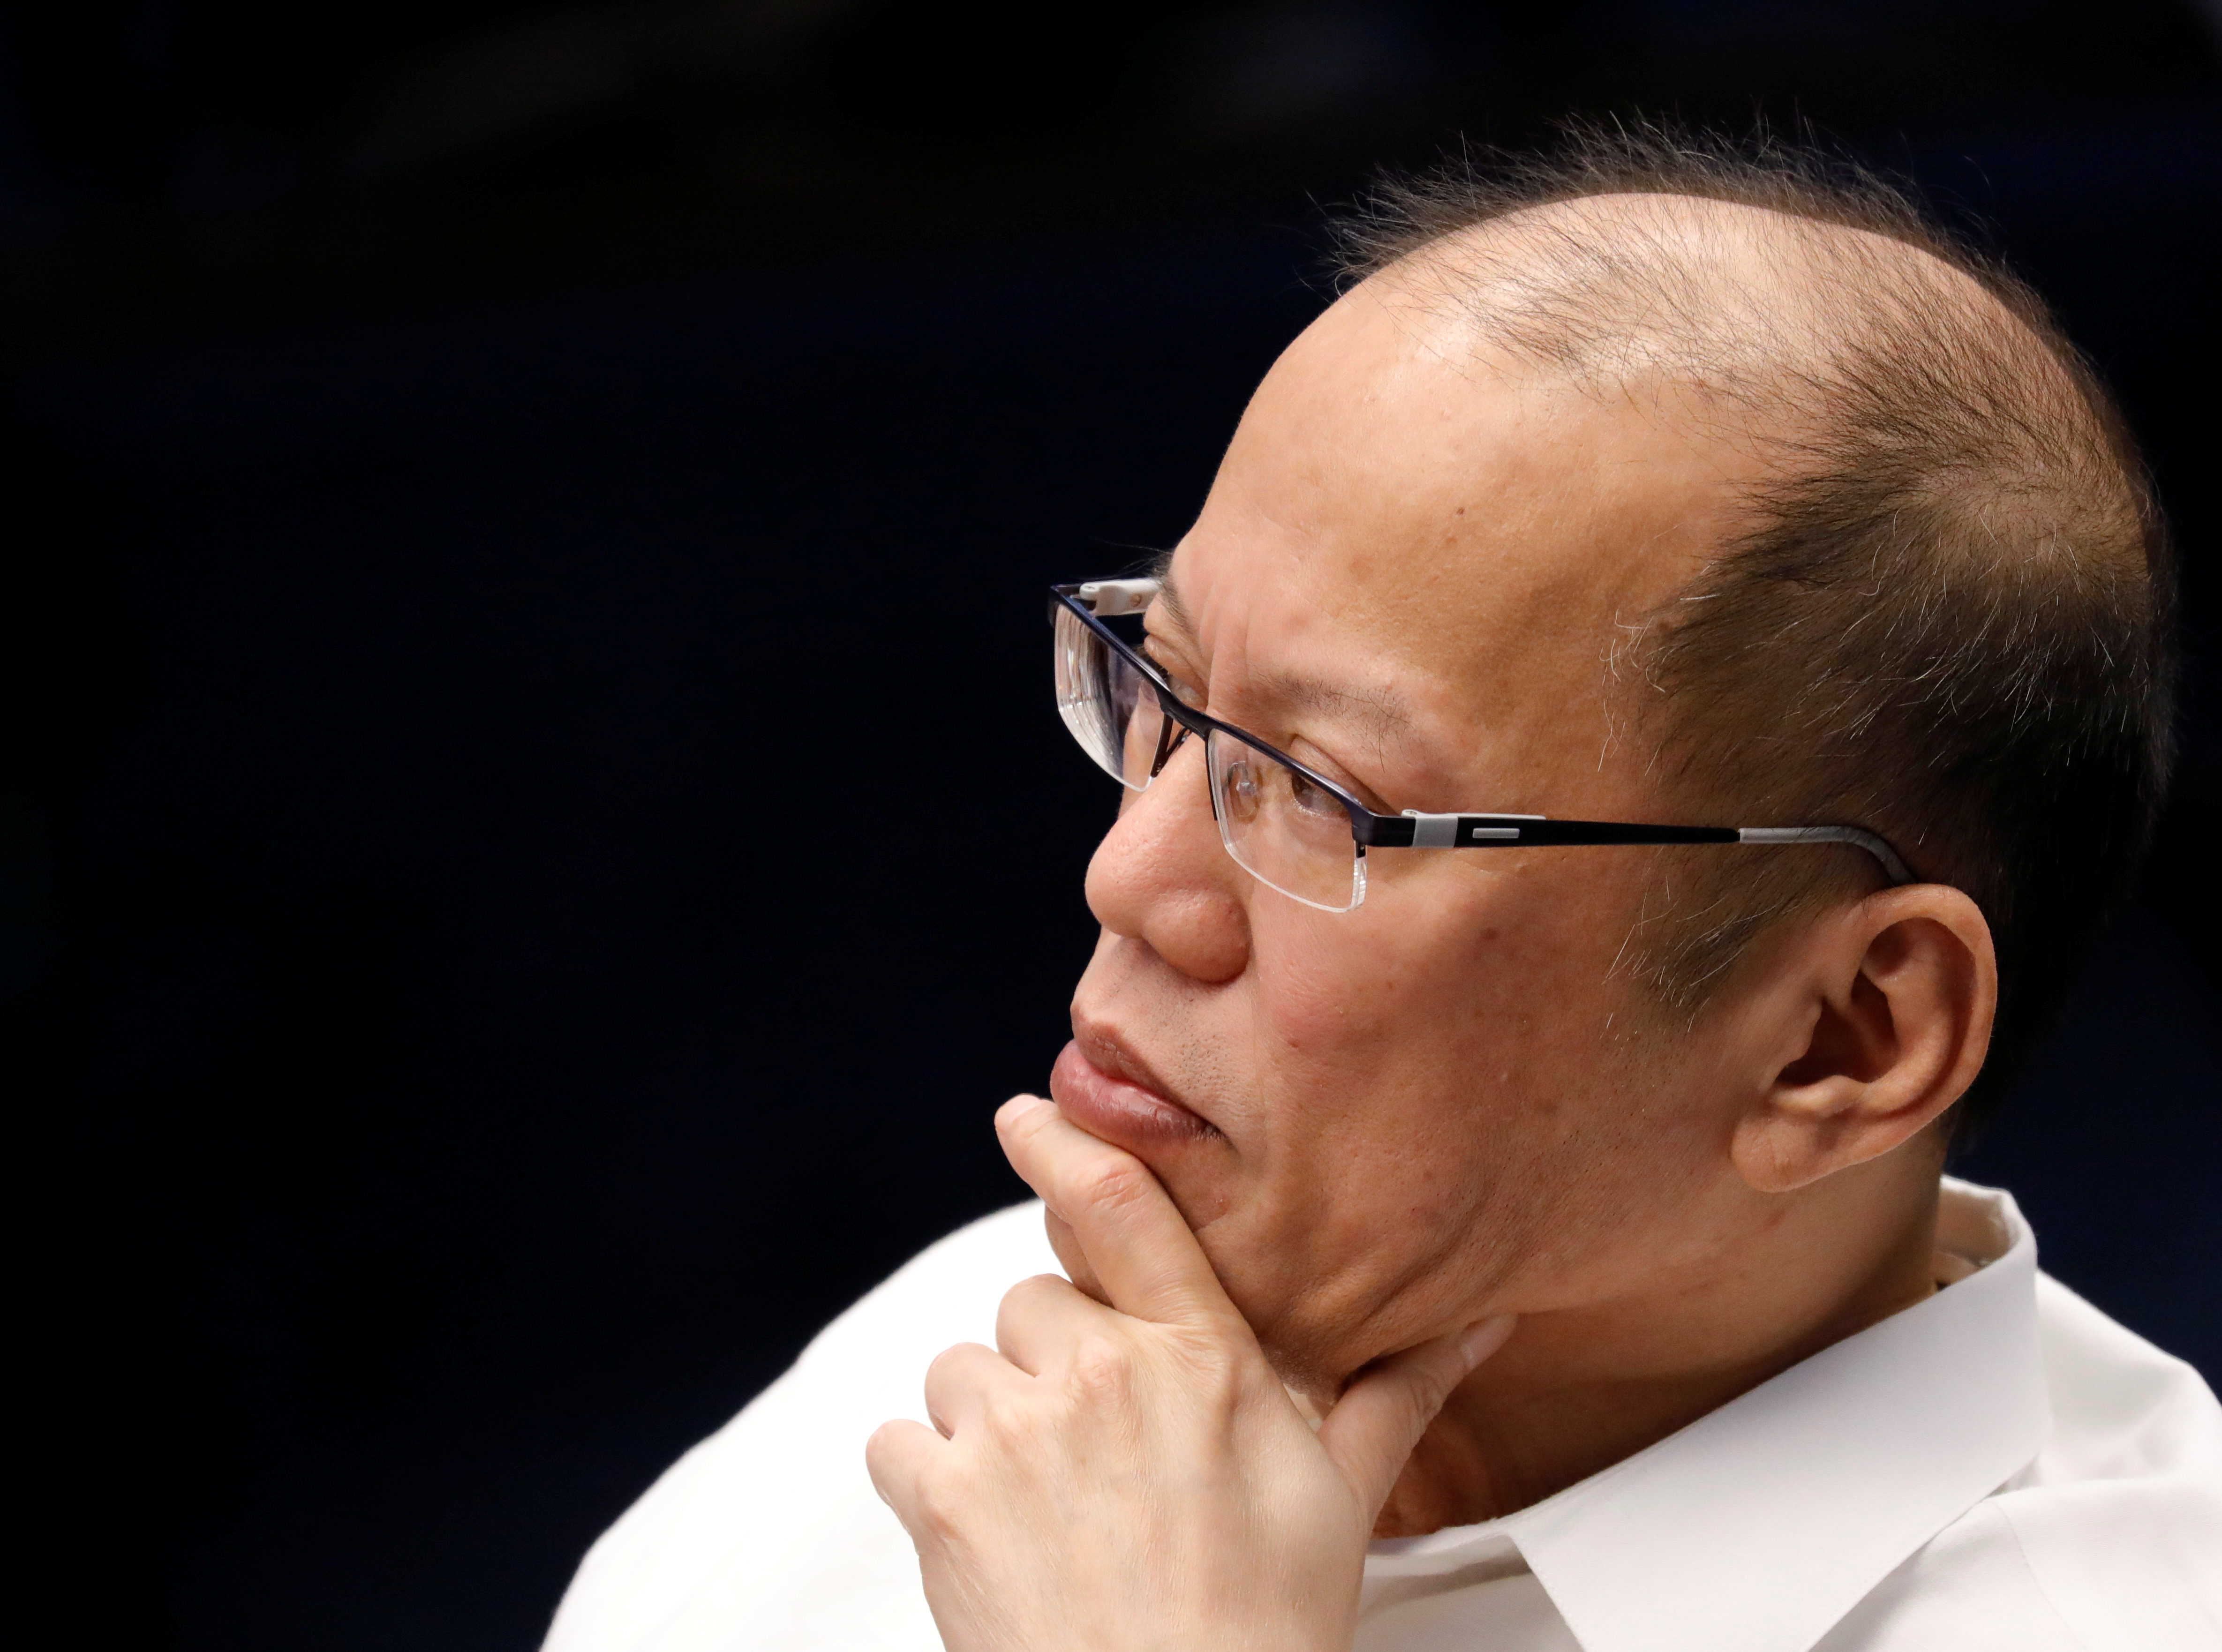 Former Philippine's President Benigno Aquino III listens during a senate hearing on the anti dengue drug Dengvaxia at the Philippine senate in Pasay city, Manila, Philippines December 14, 2017. REUTERS/Dondi Tawatao